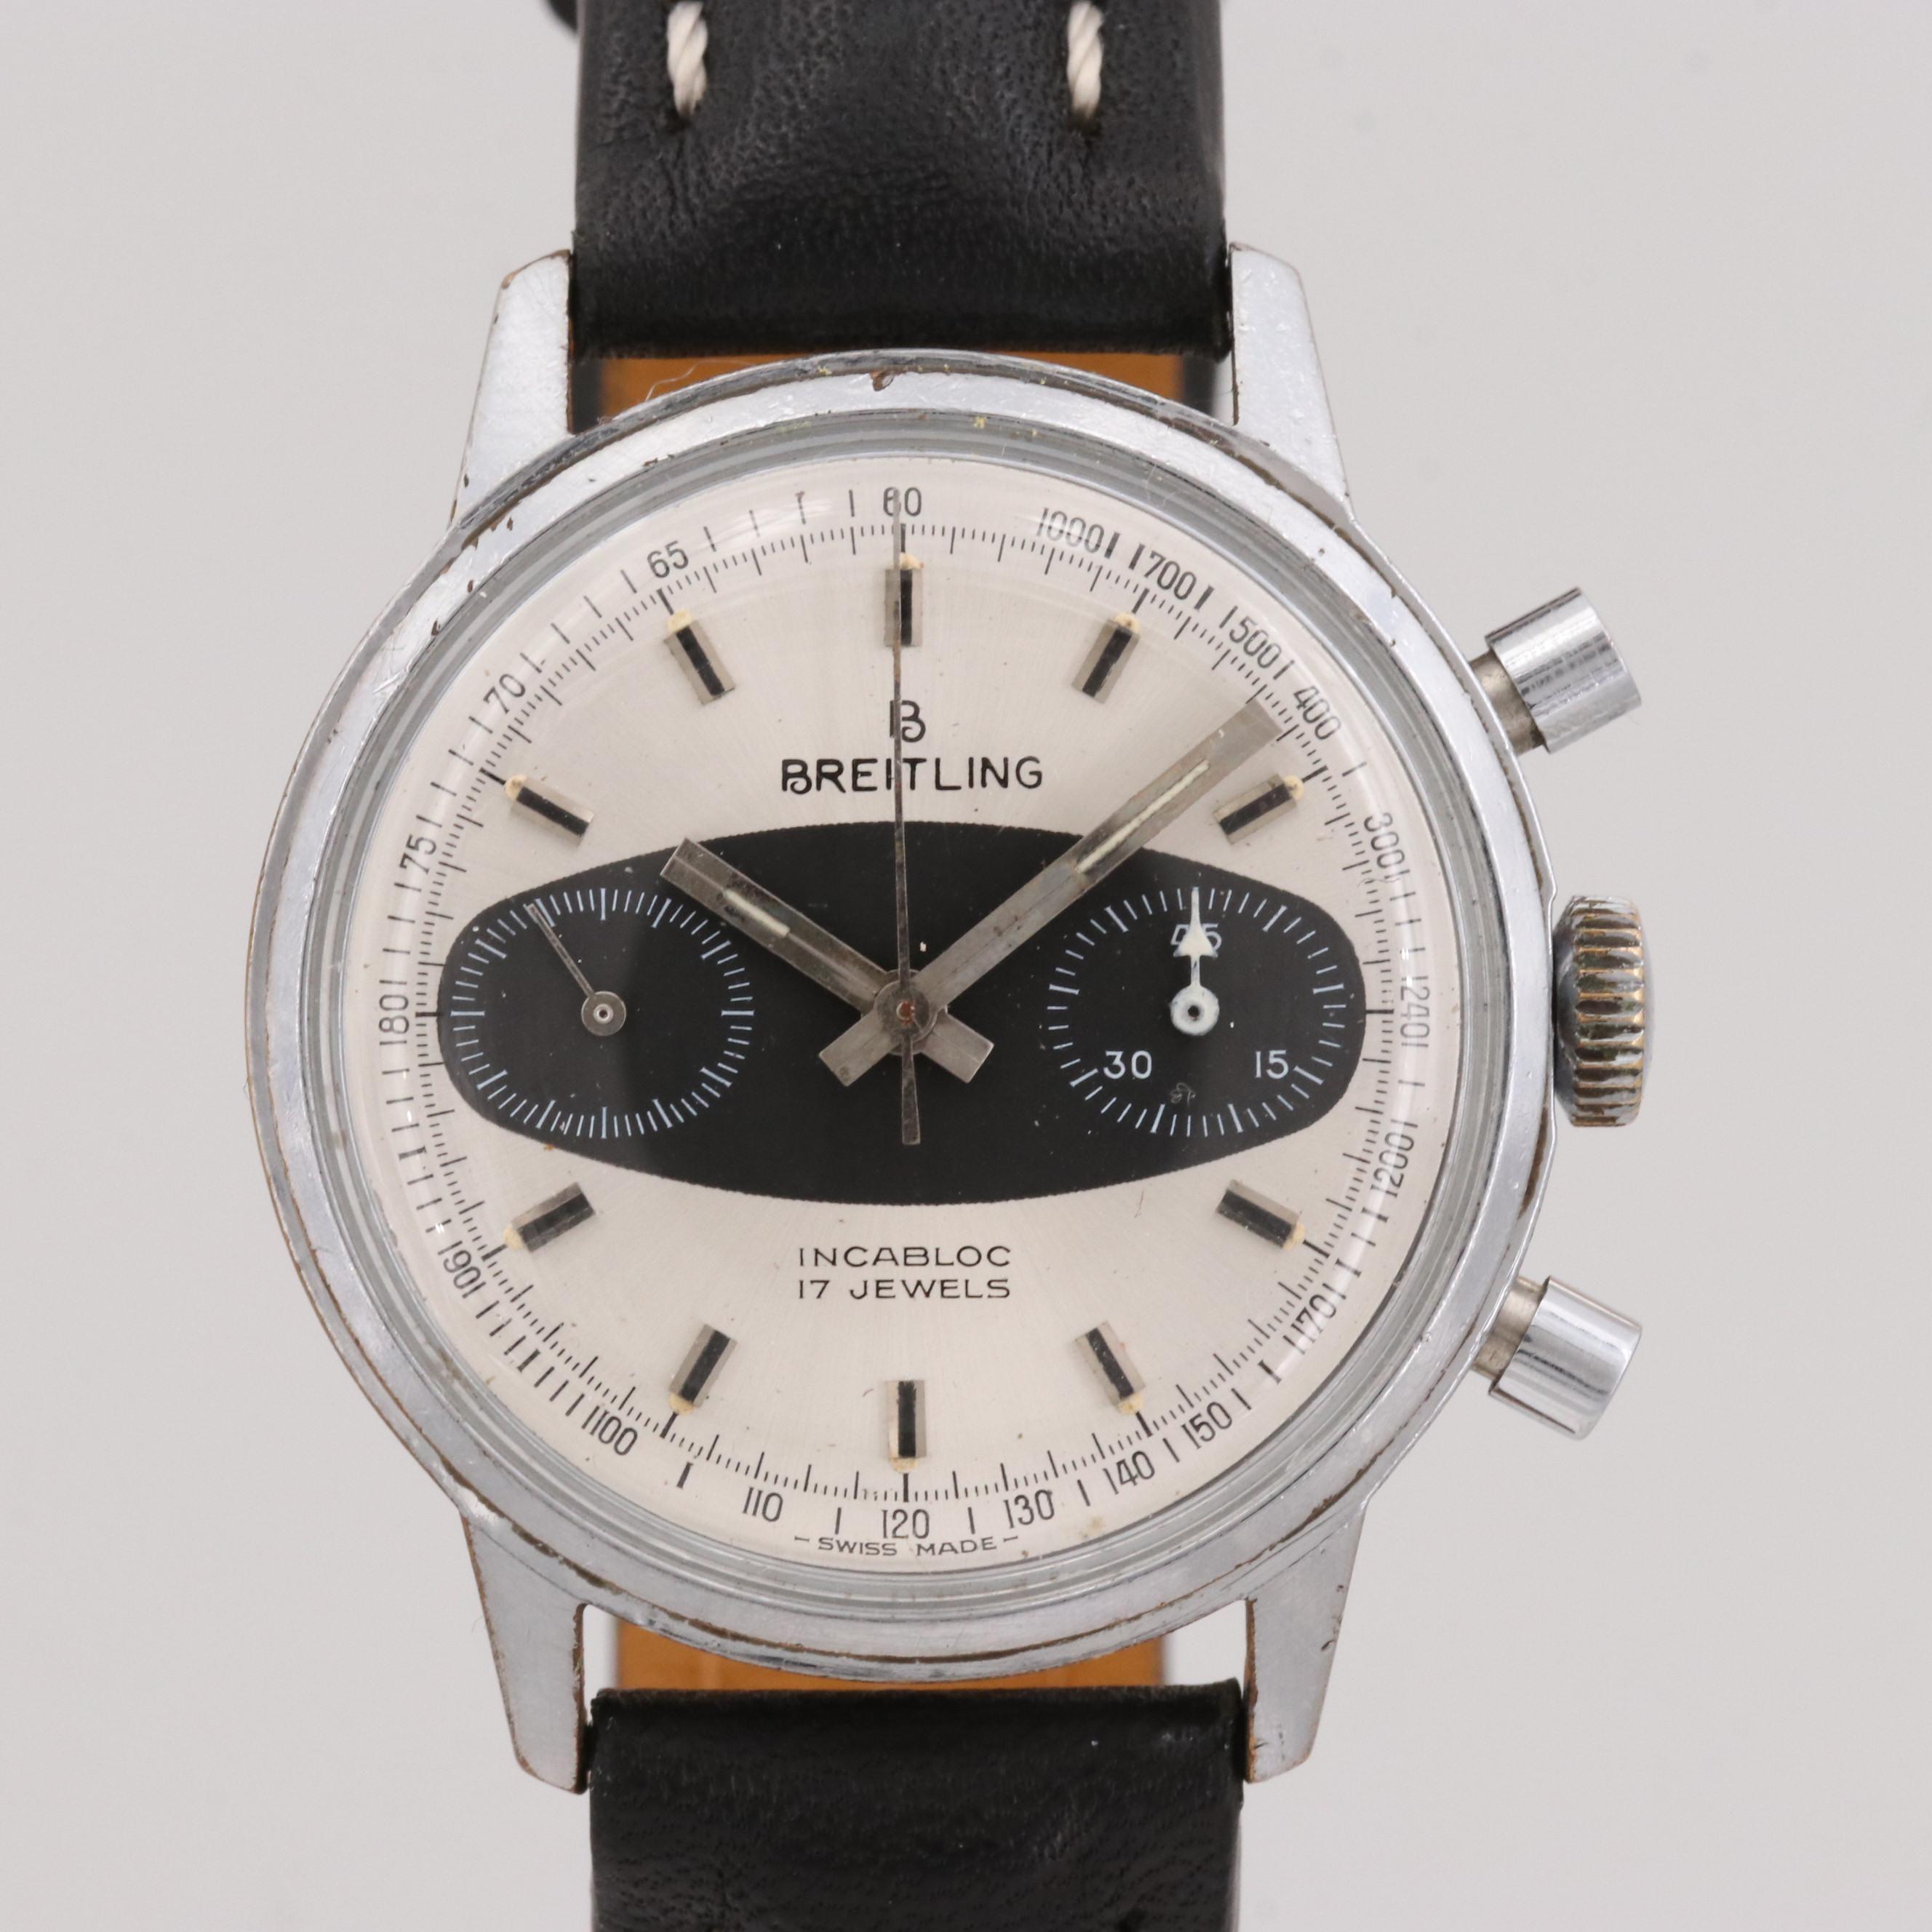 Vintage Breitling Stainless Steel  Stem Wind Wristwatch